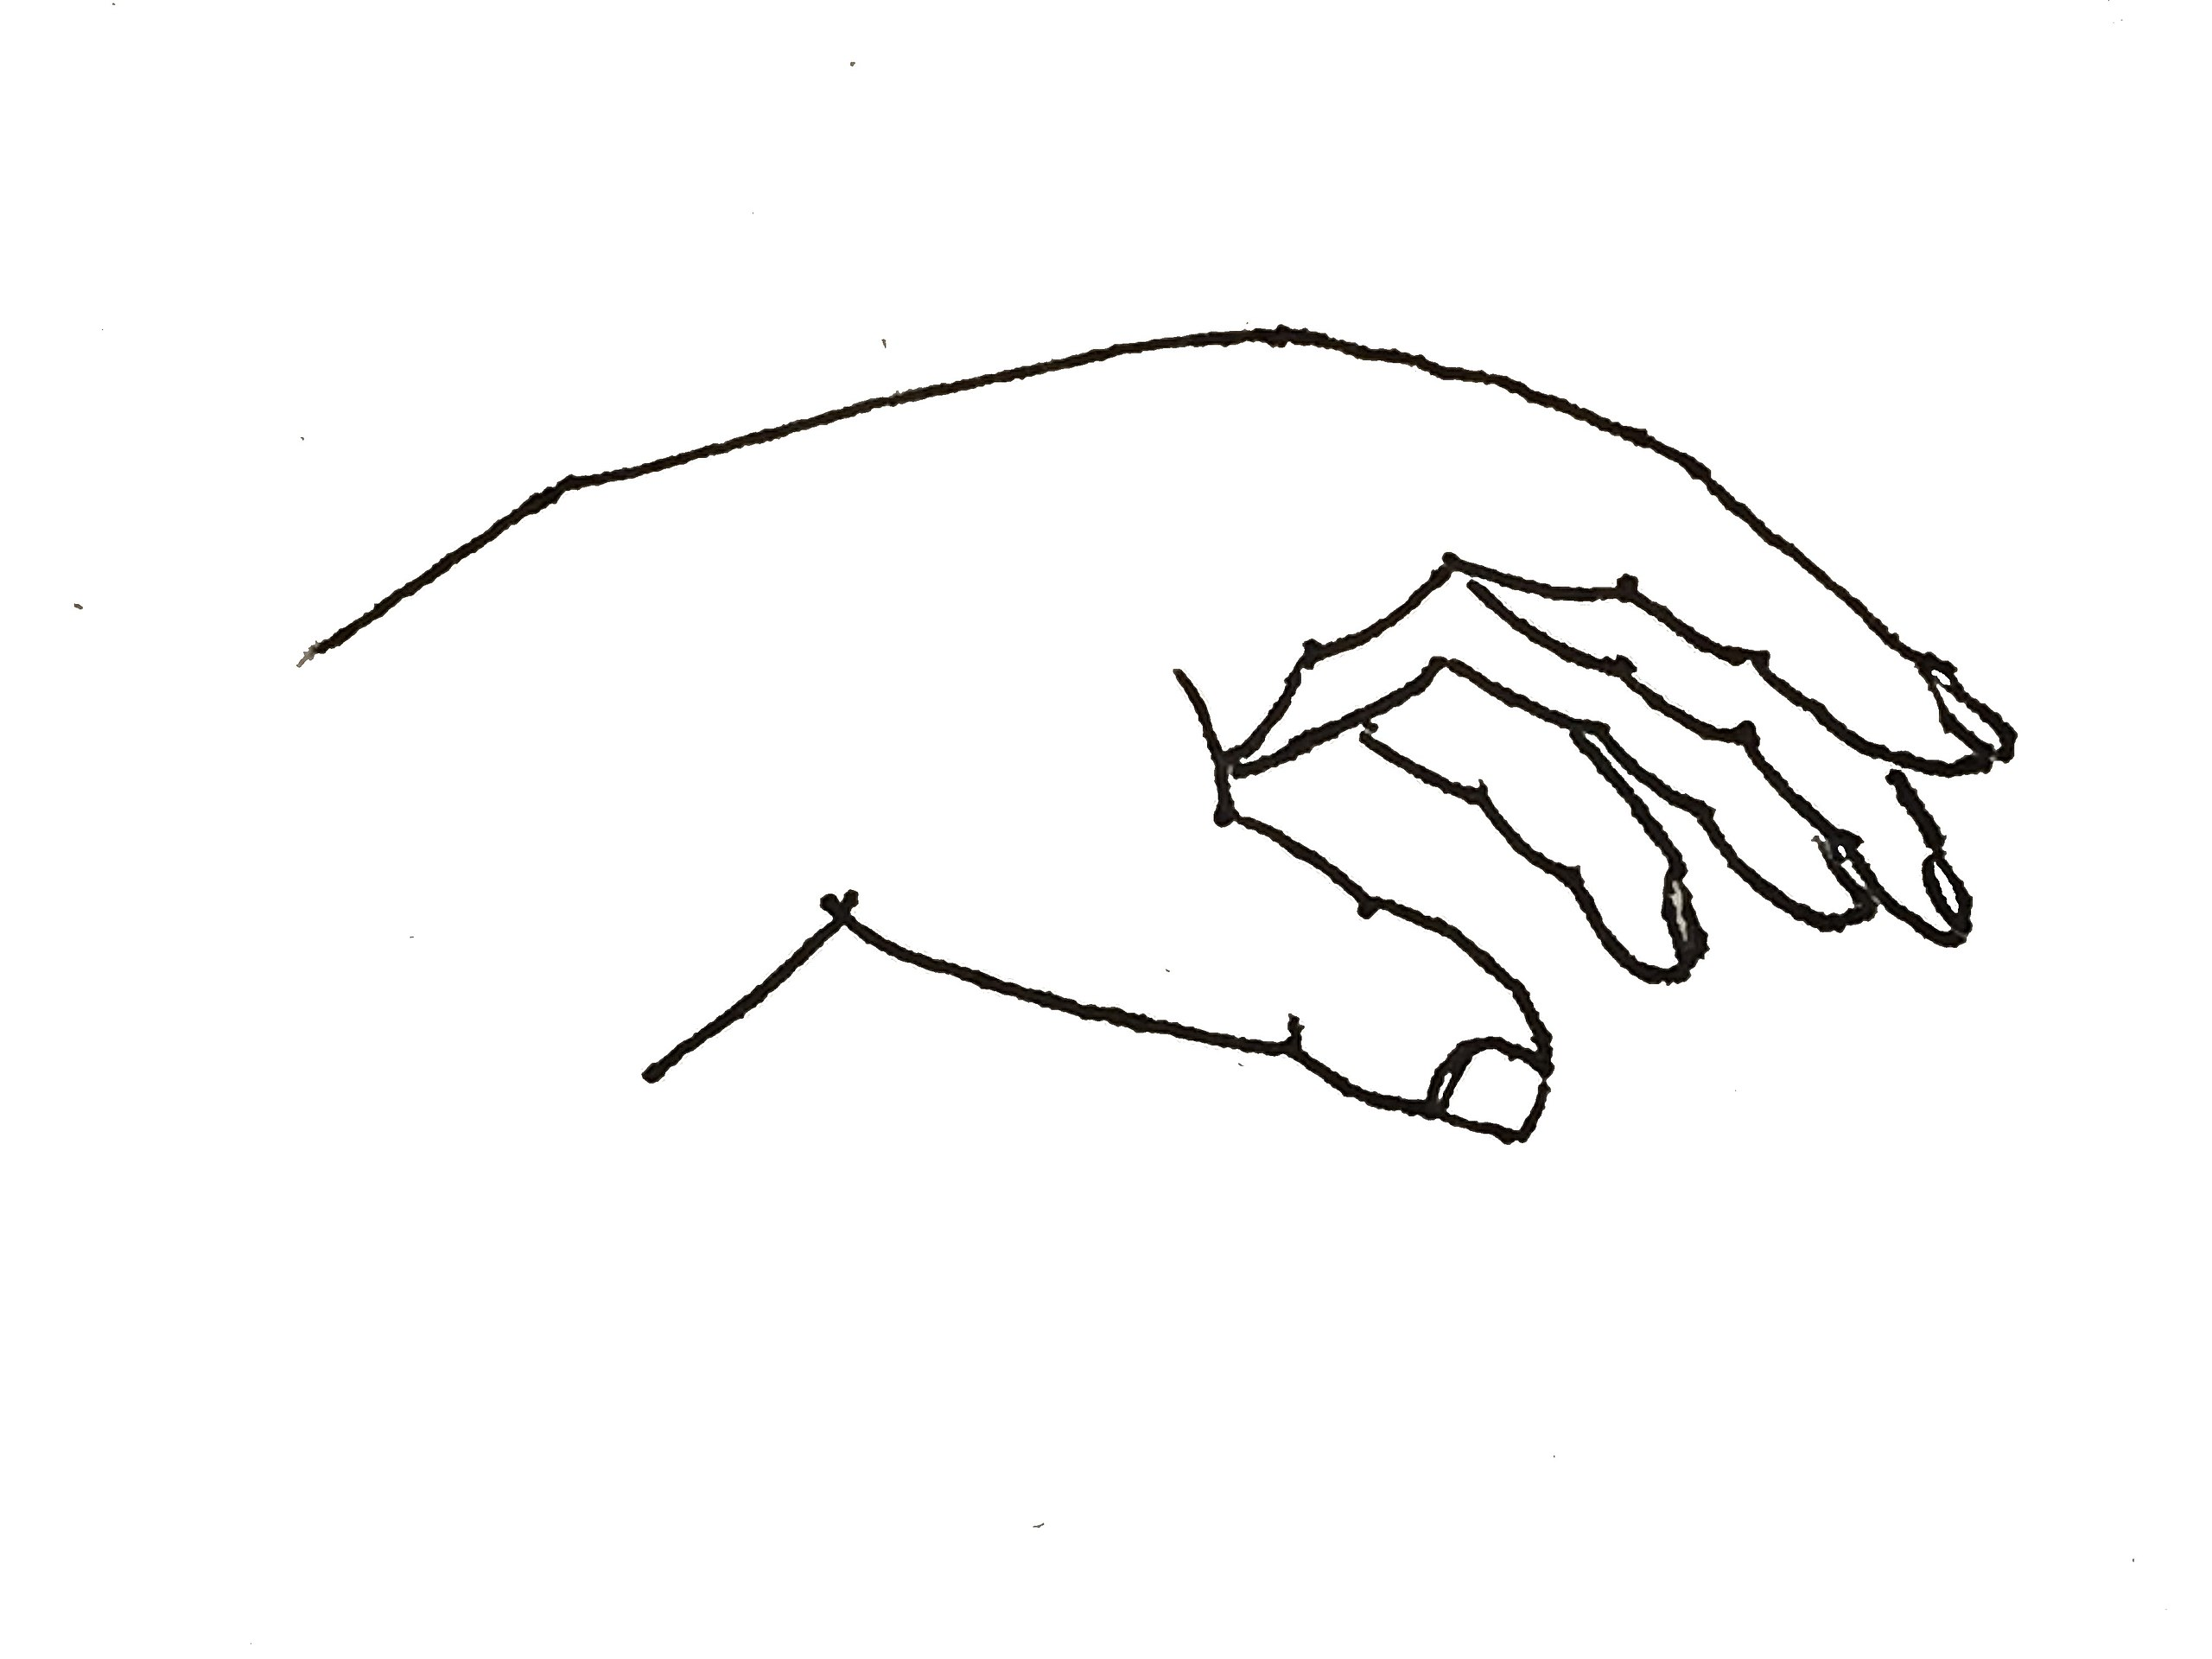 FileSolfege hand sign la.jpg   Wikimedia Commons